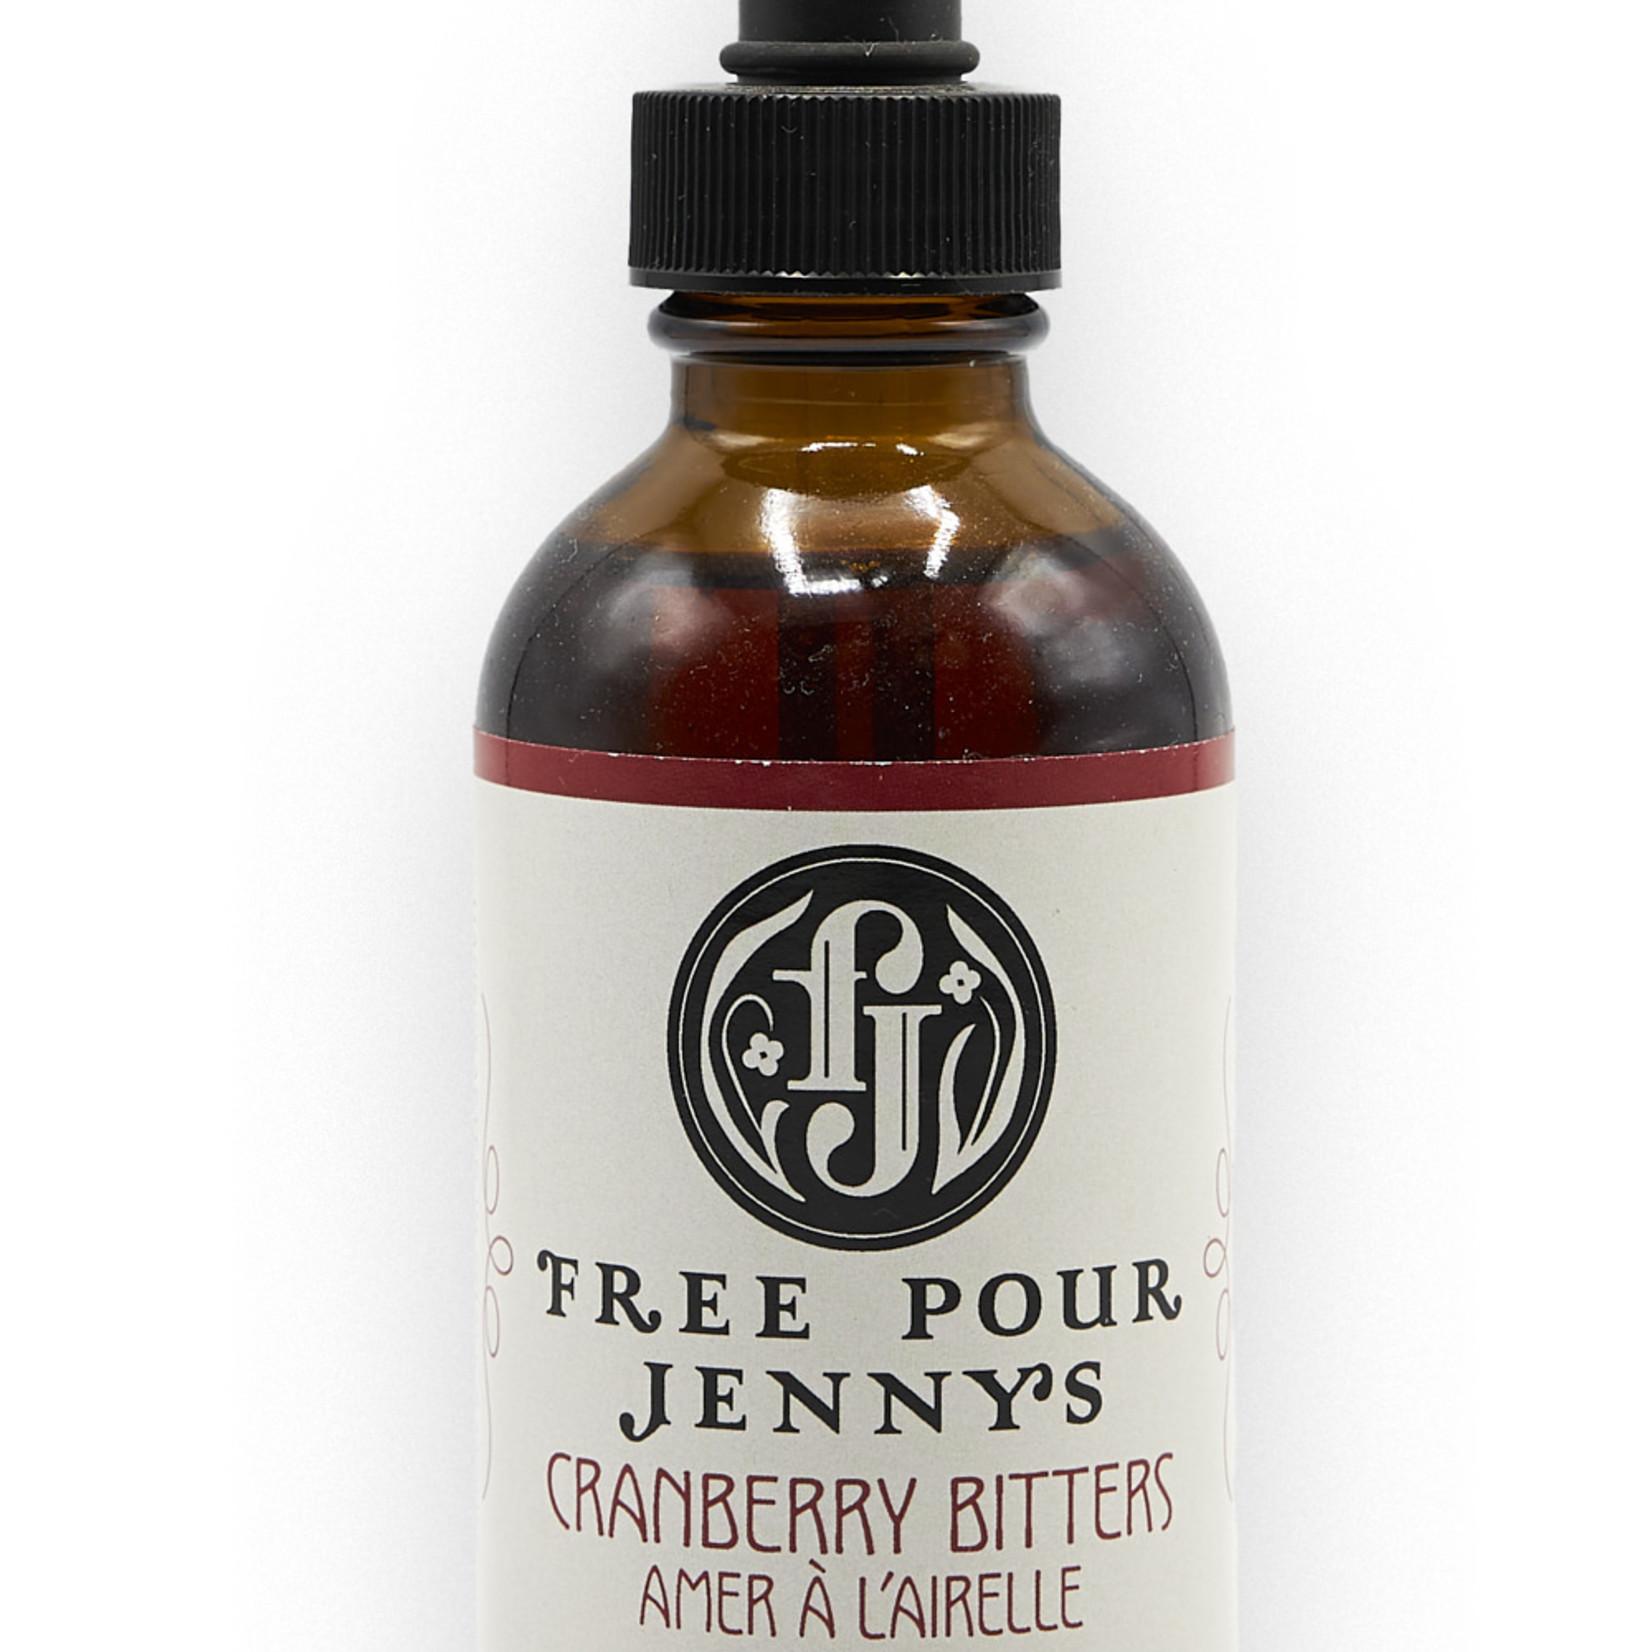 Free Pour Jenny's Free Pour Jenny's Bitters Cranberry